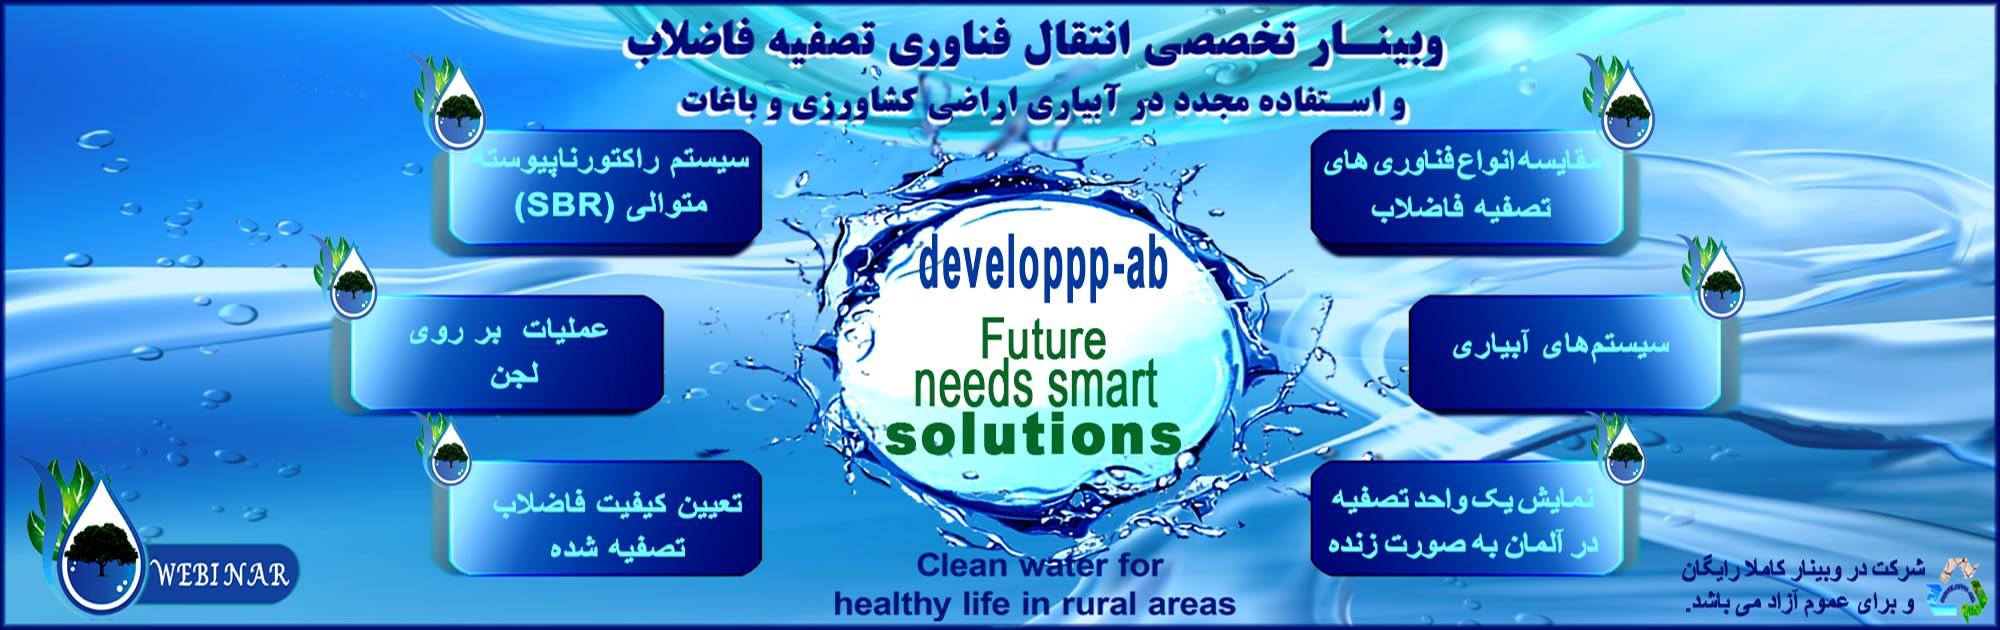 developpp-ab